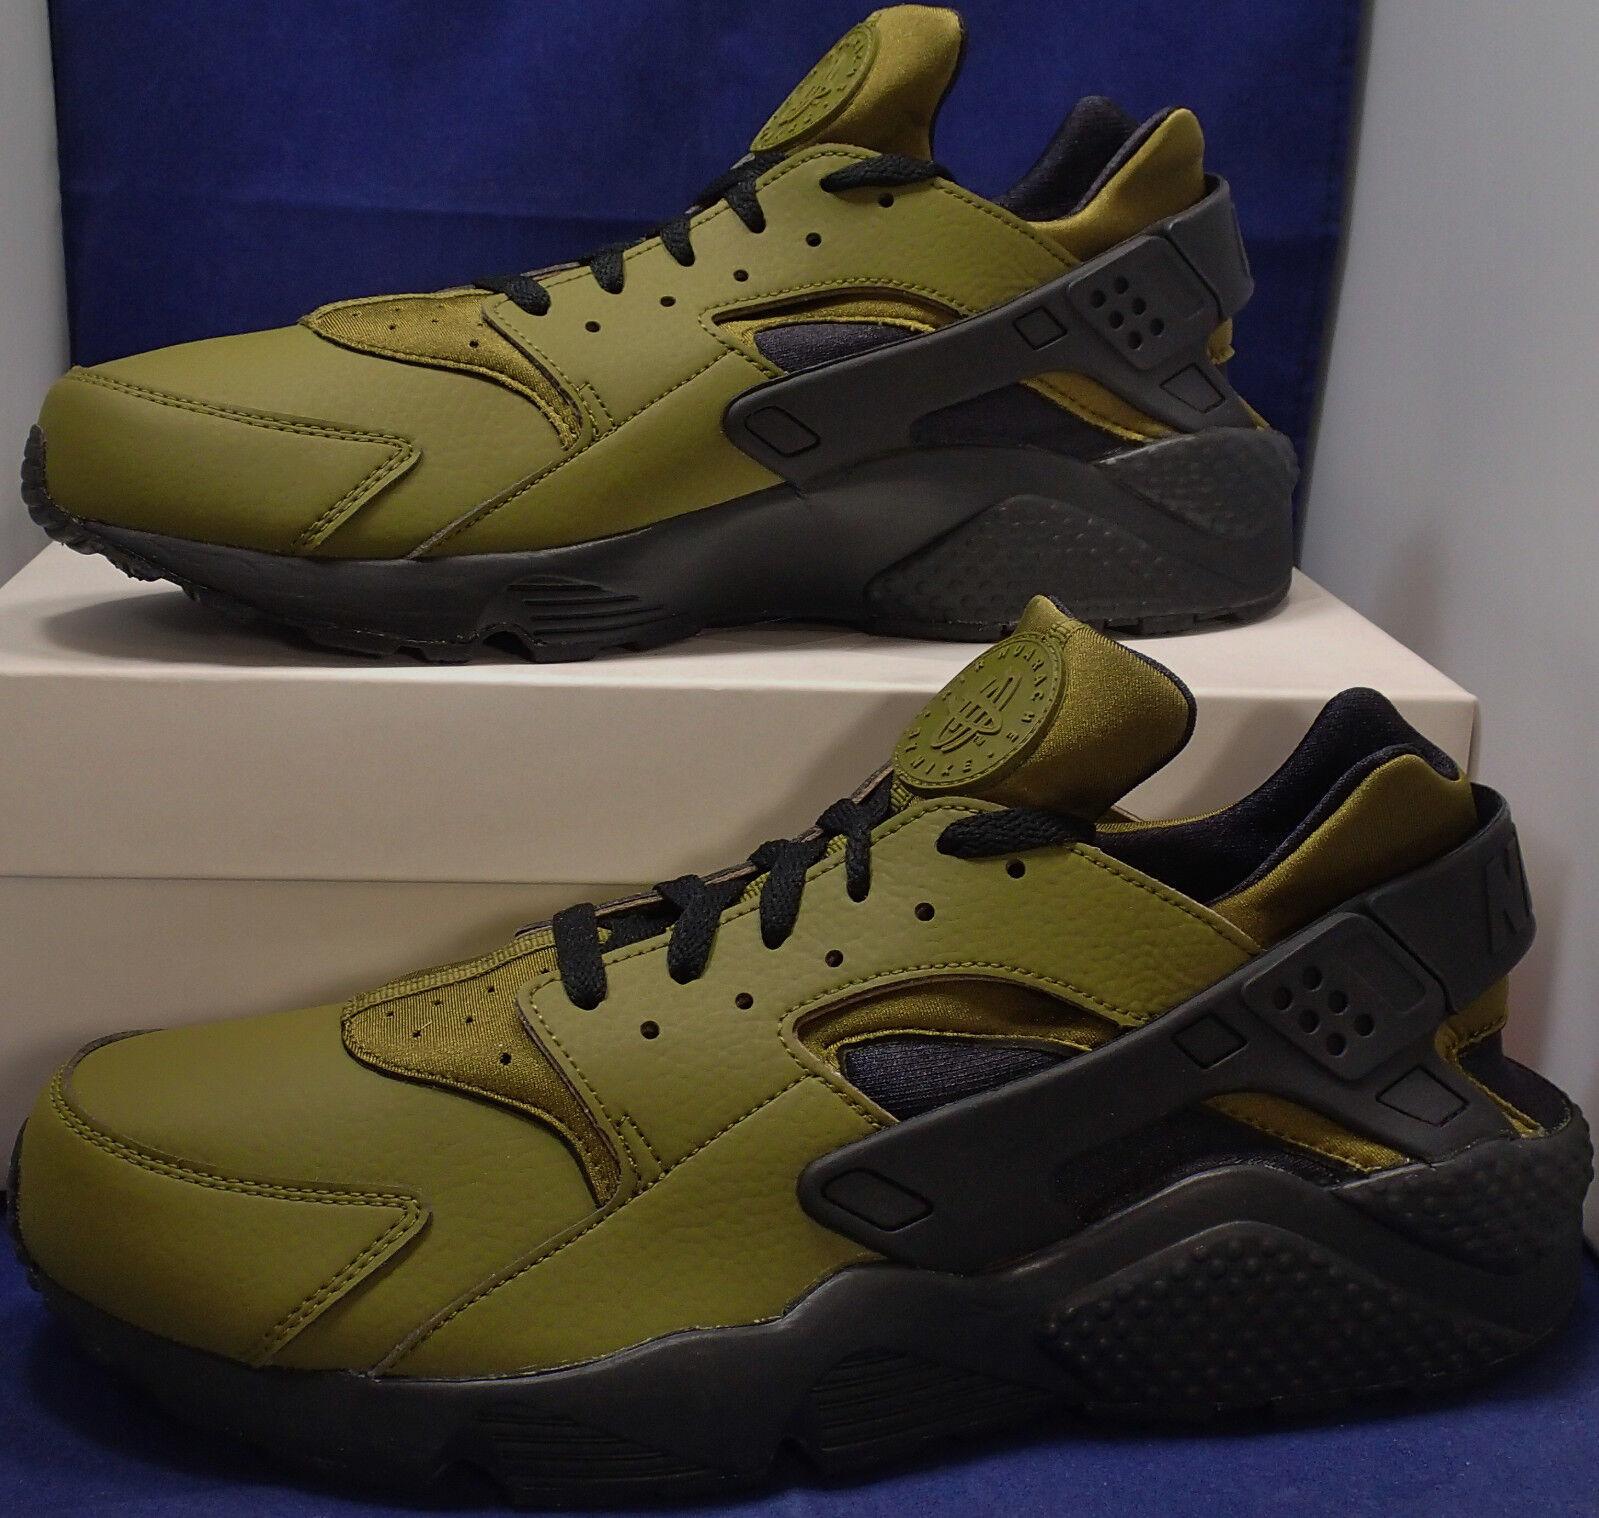 Nike Air Huarache Run iD Dark Olive Green Black SZ 13 ( 777330-985 )